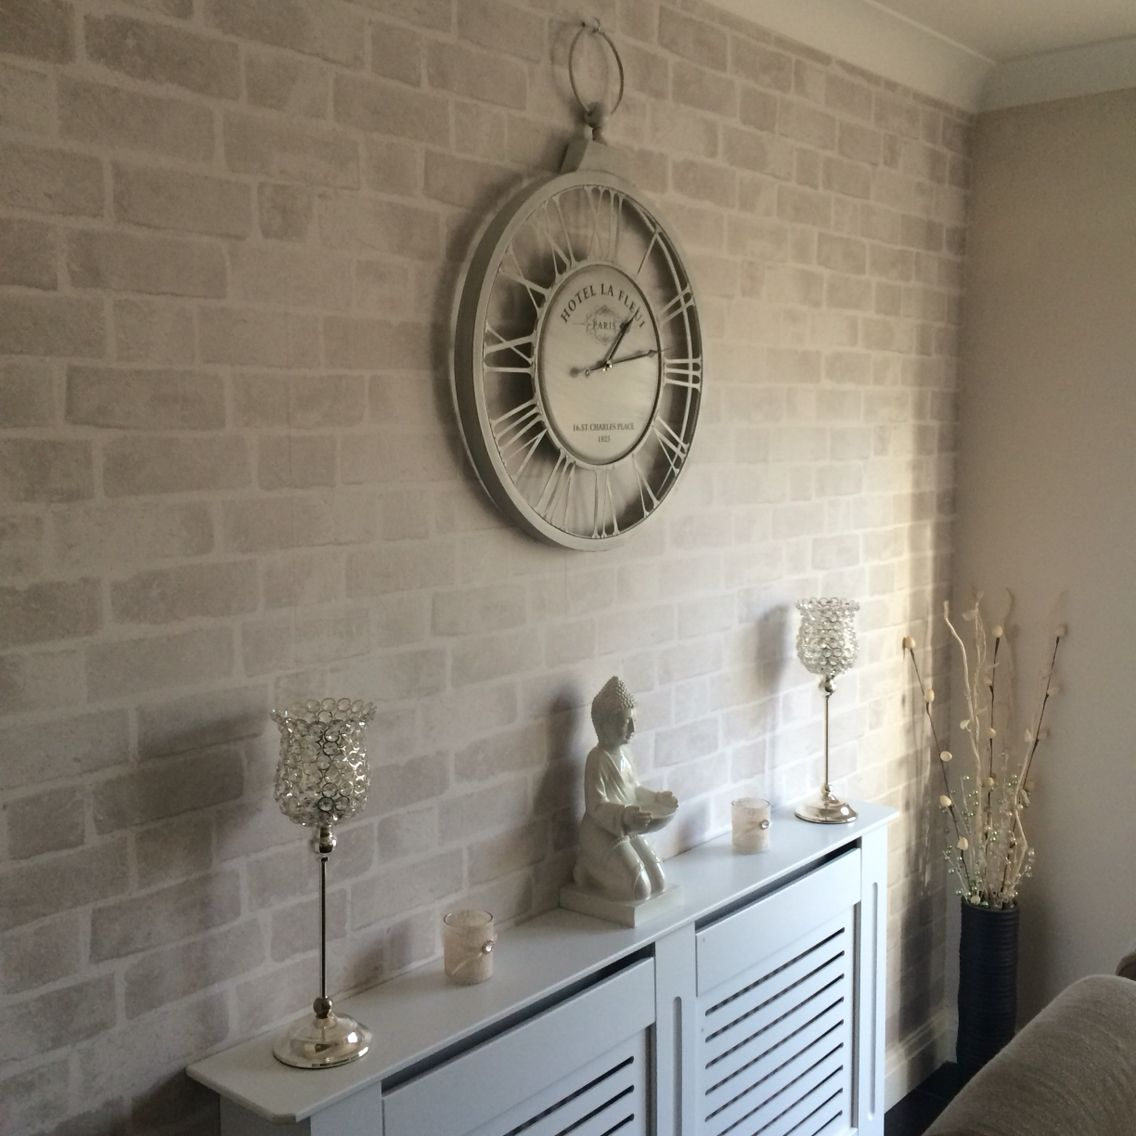 Stone Effect Kitchen Wallpaper: Dining Room, Next Brick Wallpaper …